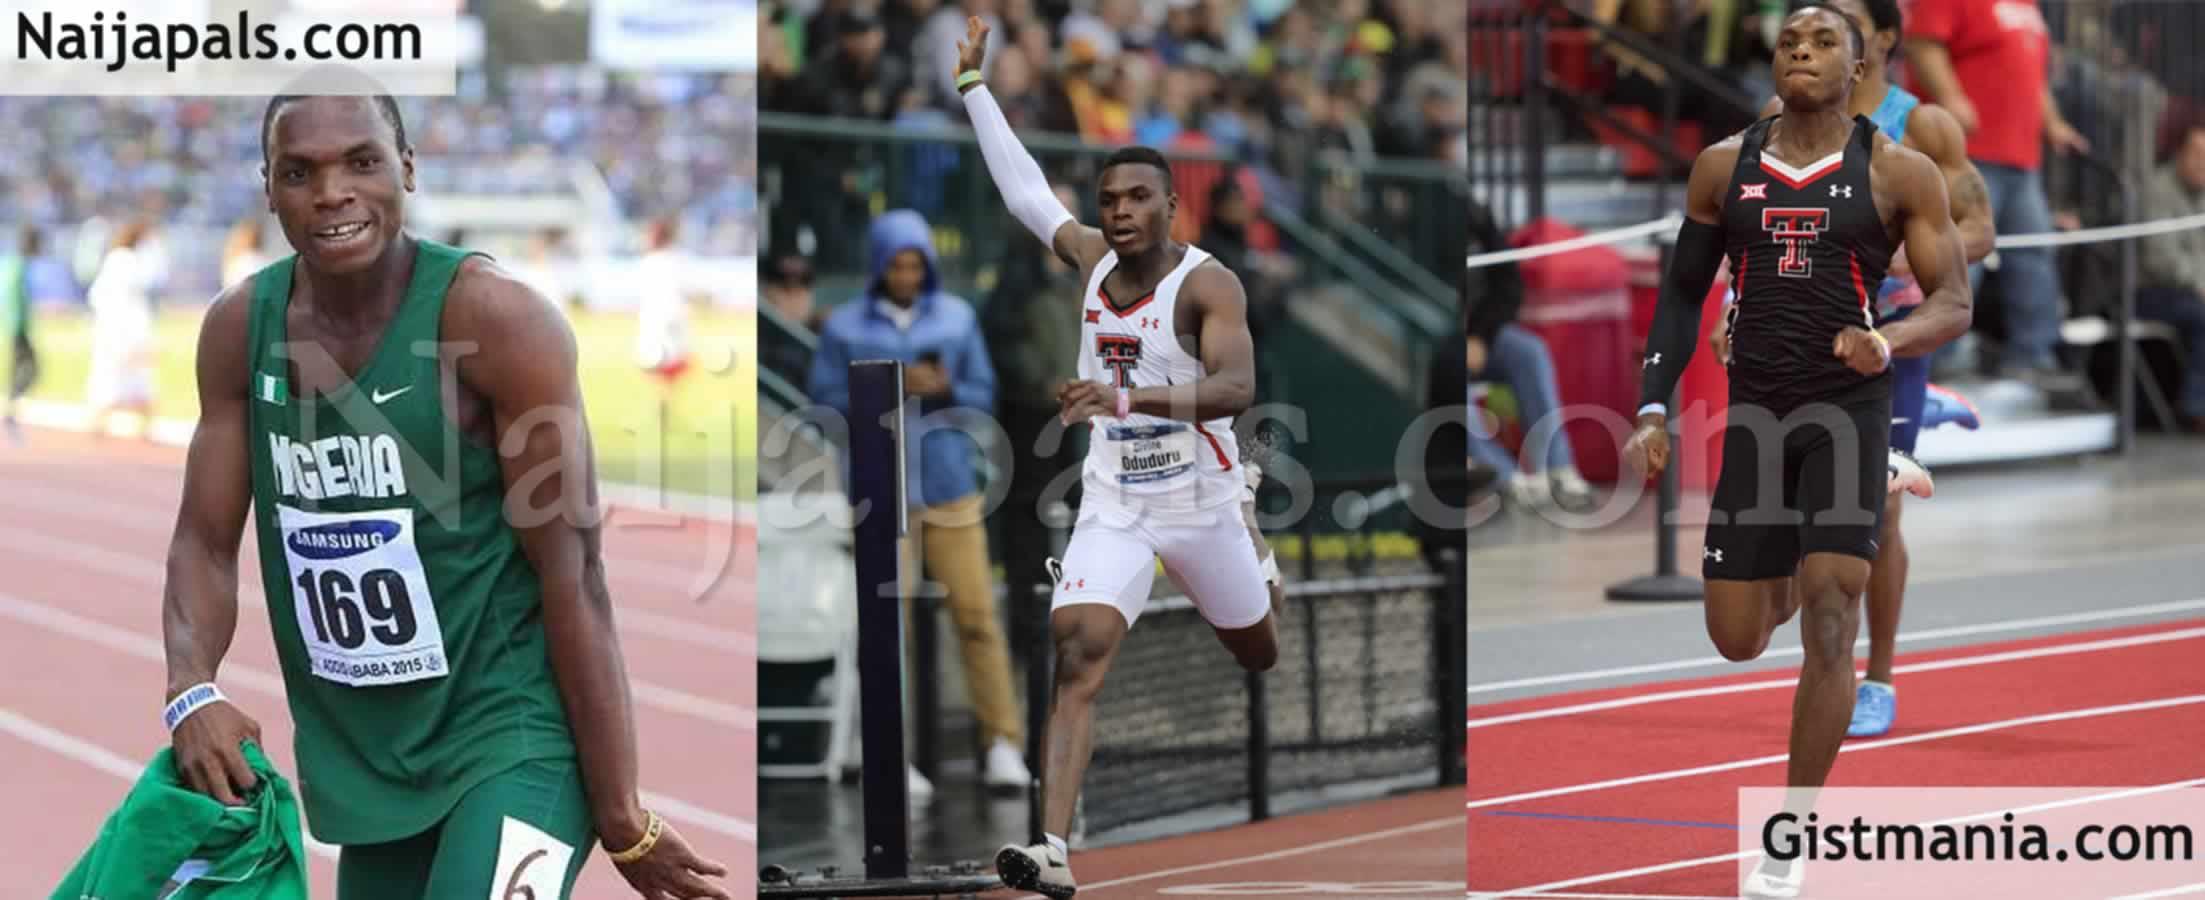 <img alt='.' class='lazyload' data-src='https://img.gistmania.com/emot/shocked.gif' /><img alt='.' class='lazyload' data-src='https://img.gistmania.com/emot/smh.gif' /> MORE BAD NEWS! <b>Nigerian Athlete, Divine Oduduru Disqualified For False Start At Tokyo Olympics</b>